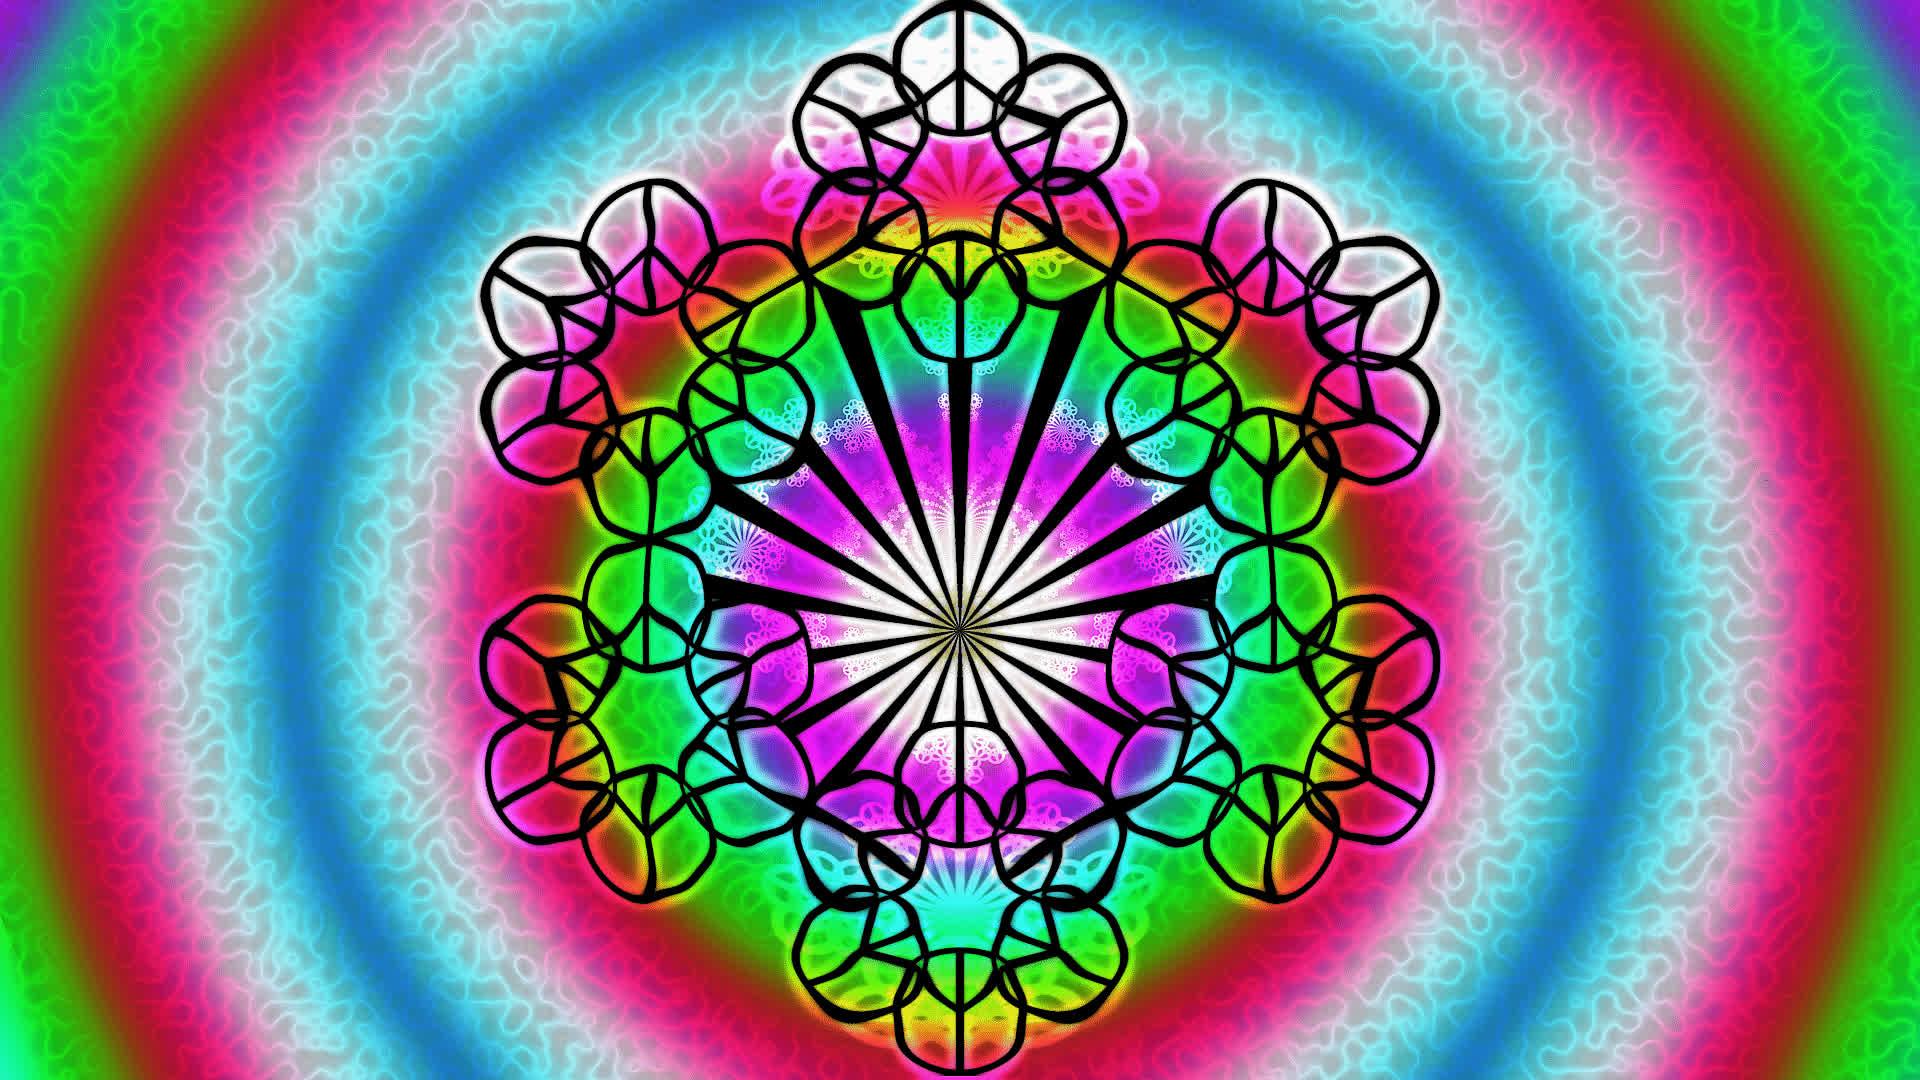 Peace GIFs